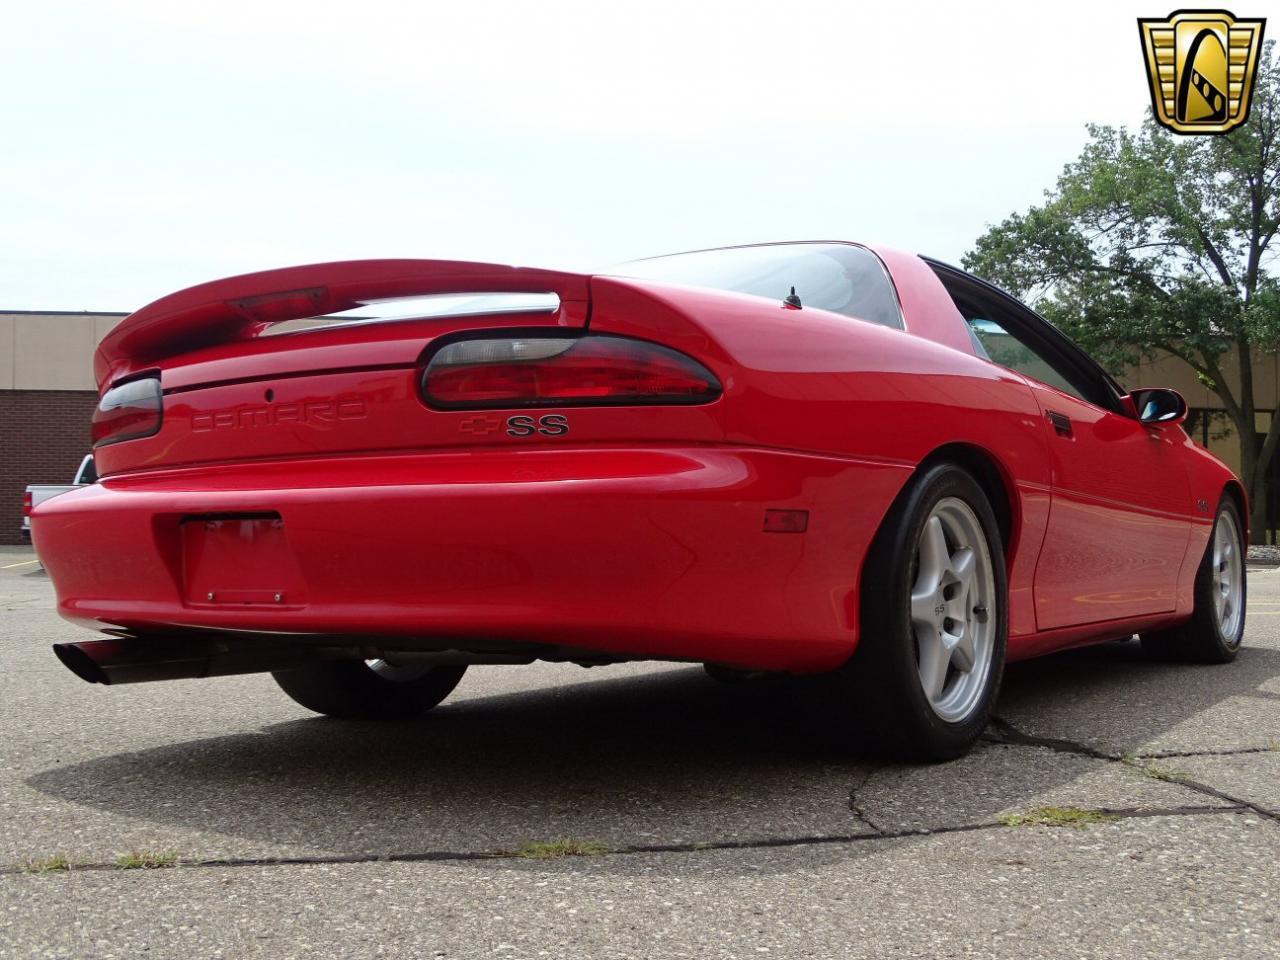 Large Picture of '96 Camaro located in Michigan - $13,595.00 - LDUP